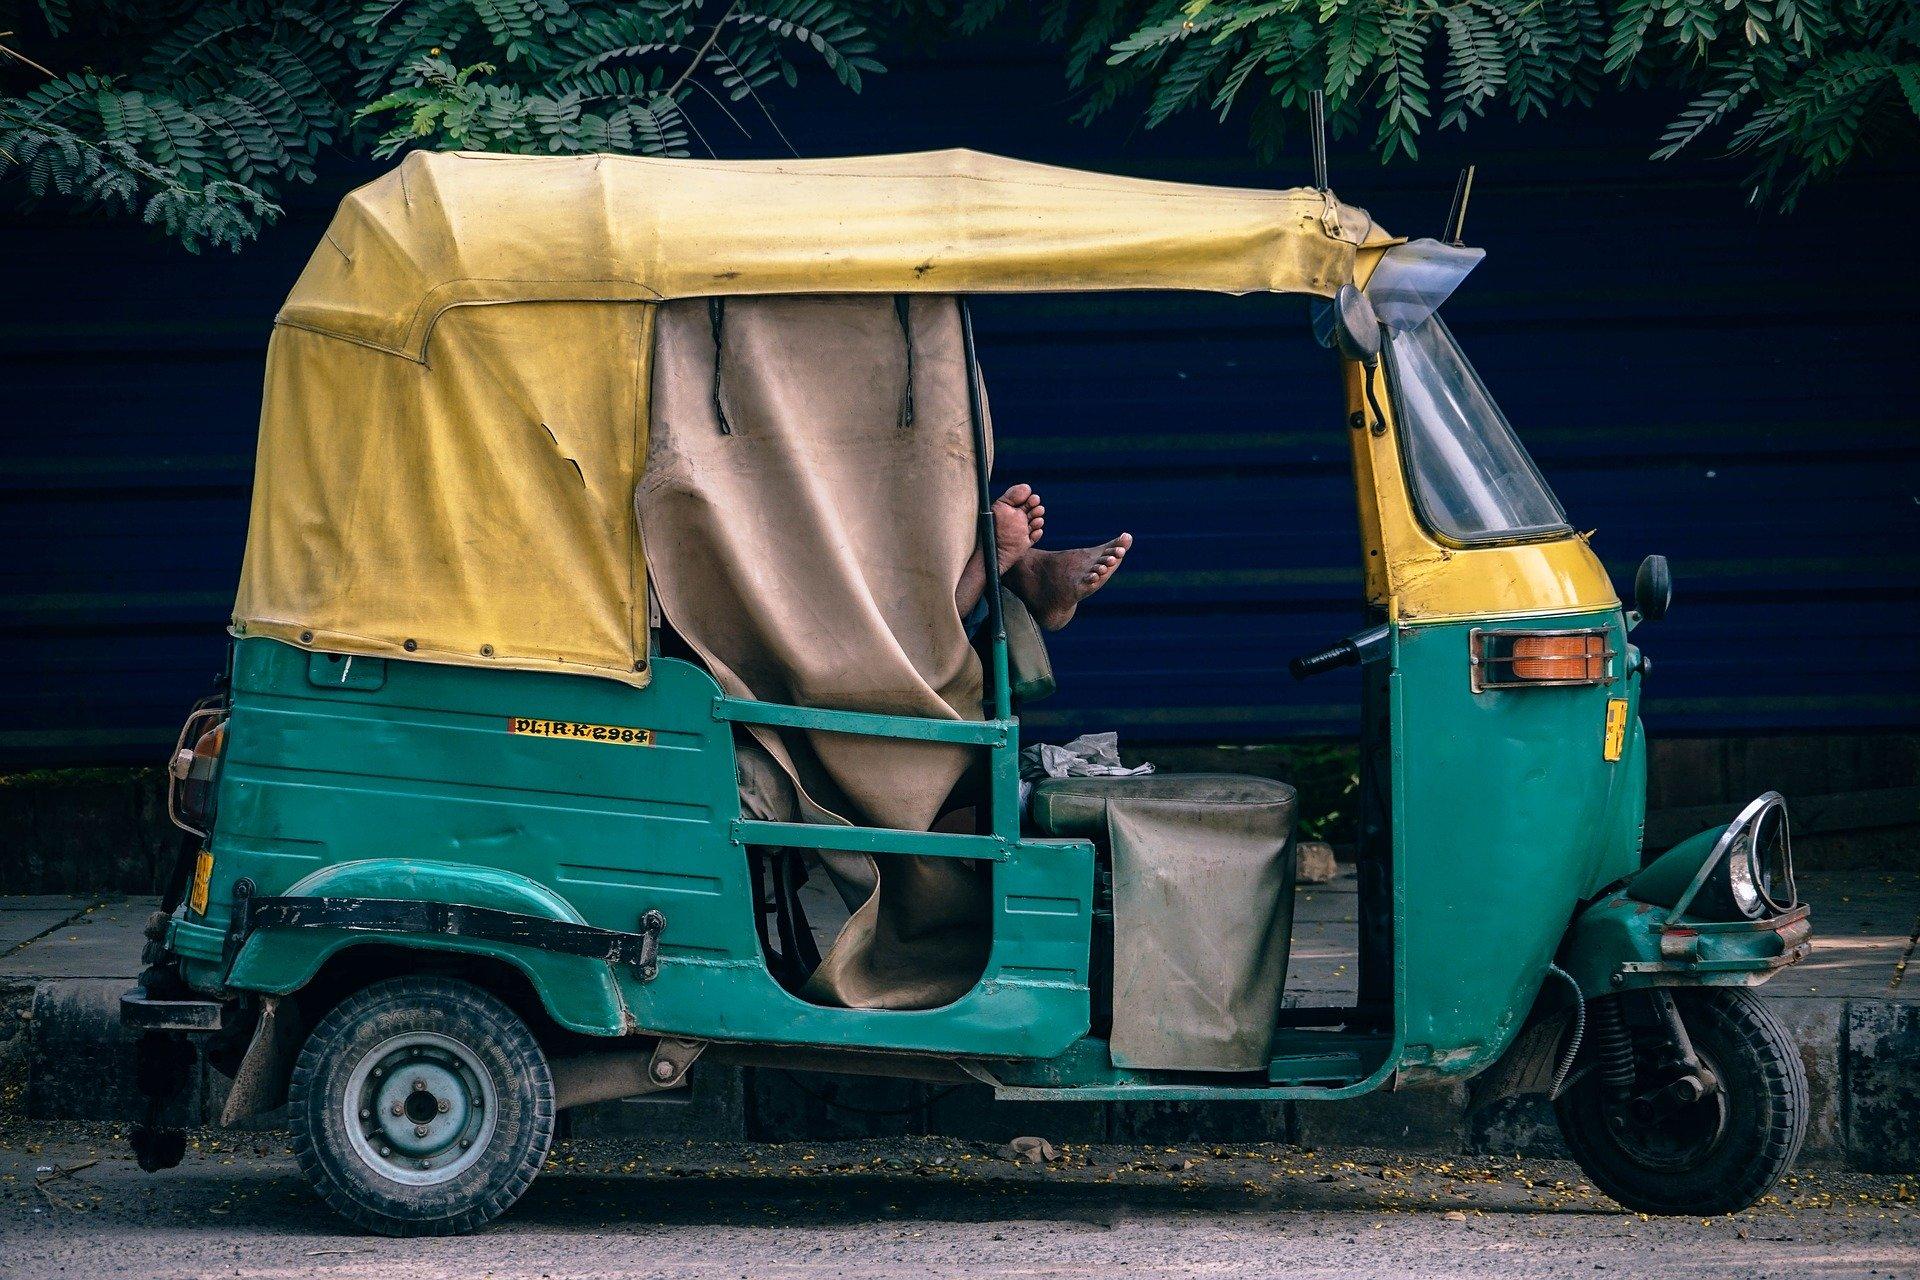 tuktuk-thailande_asie_voyager_moins-cher_transports